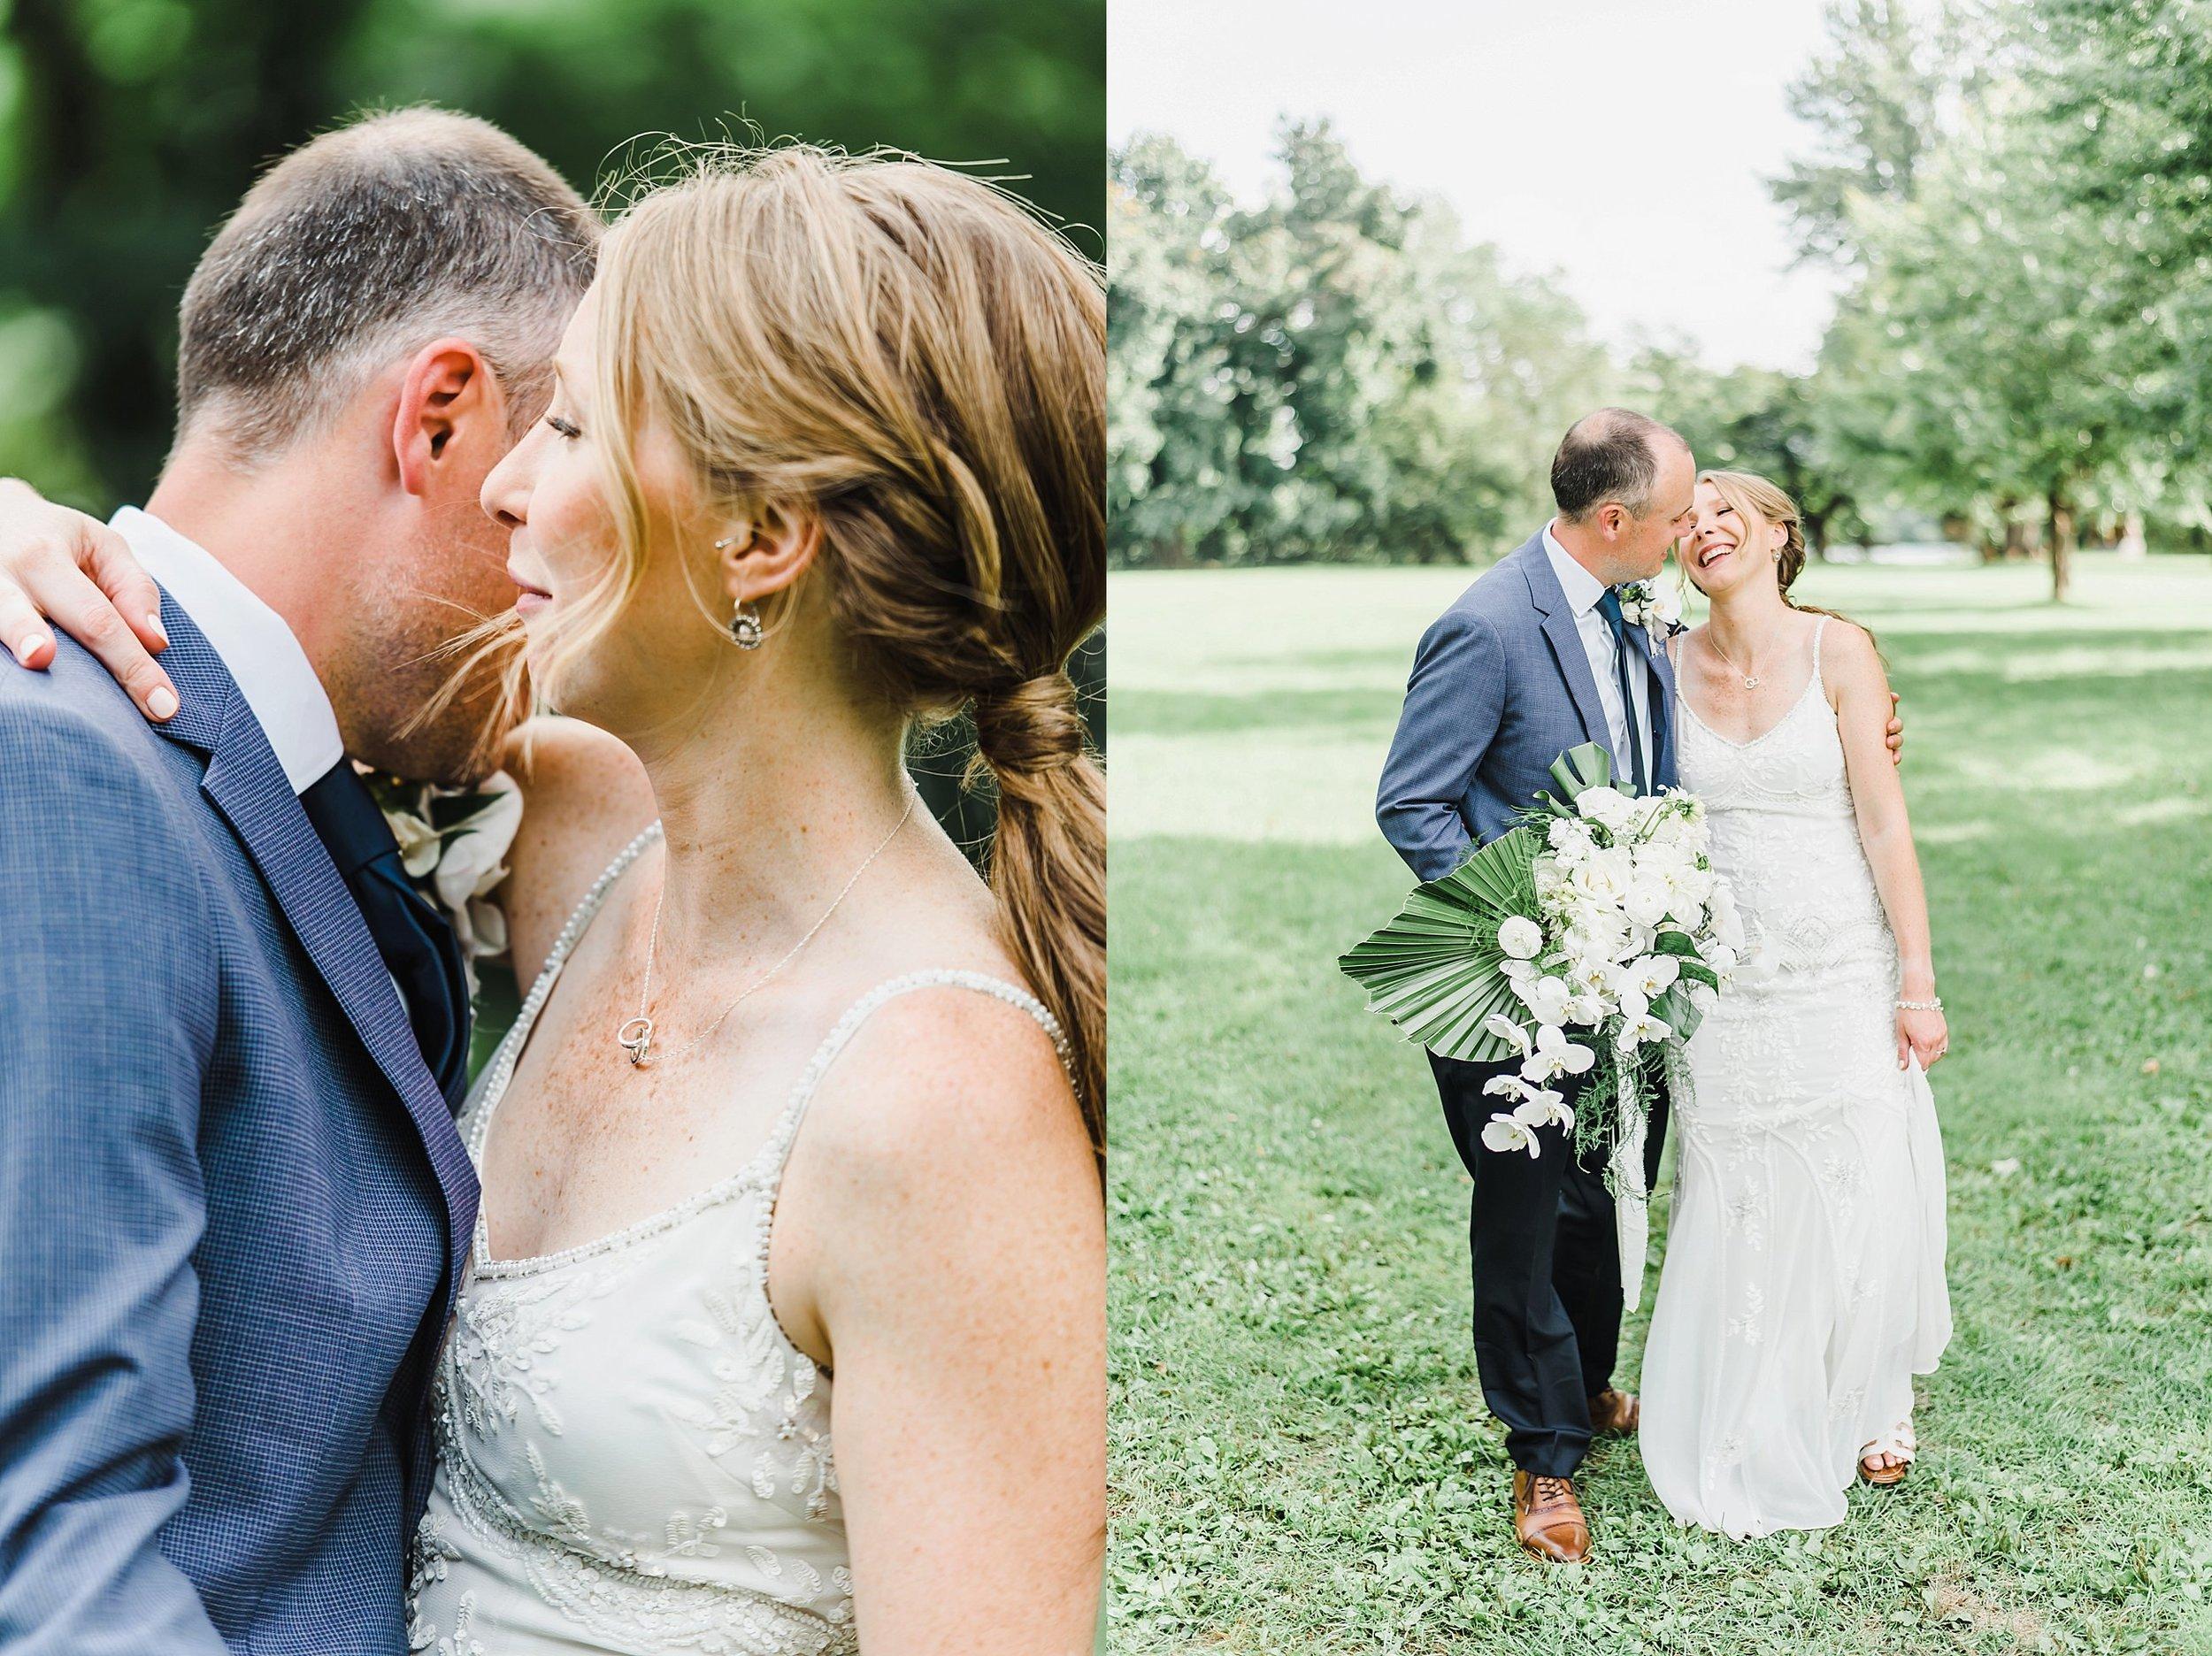 light airy indie fine art ottawa wedding photographer | Ali and Batoul Photography_0658.jpg